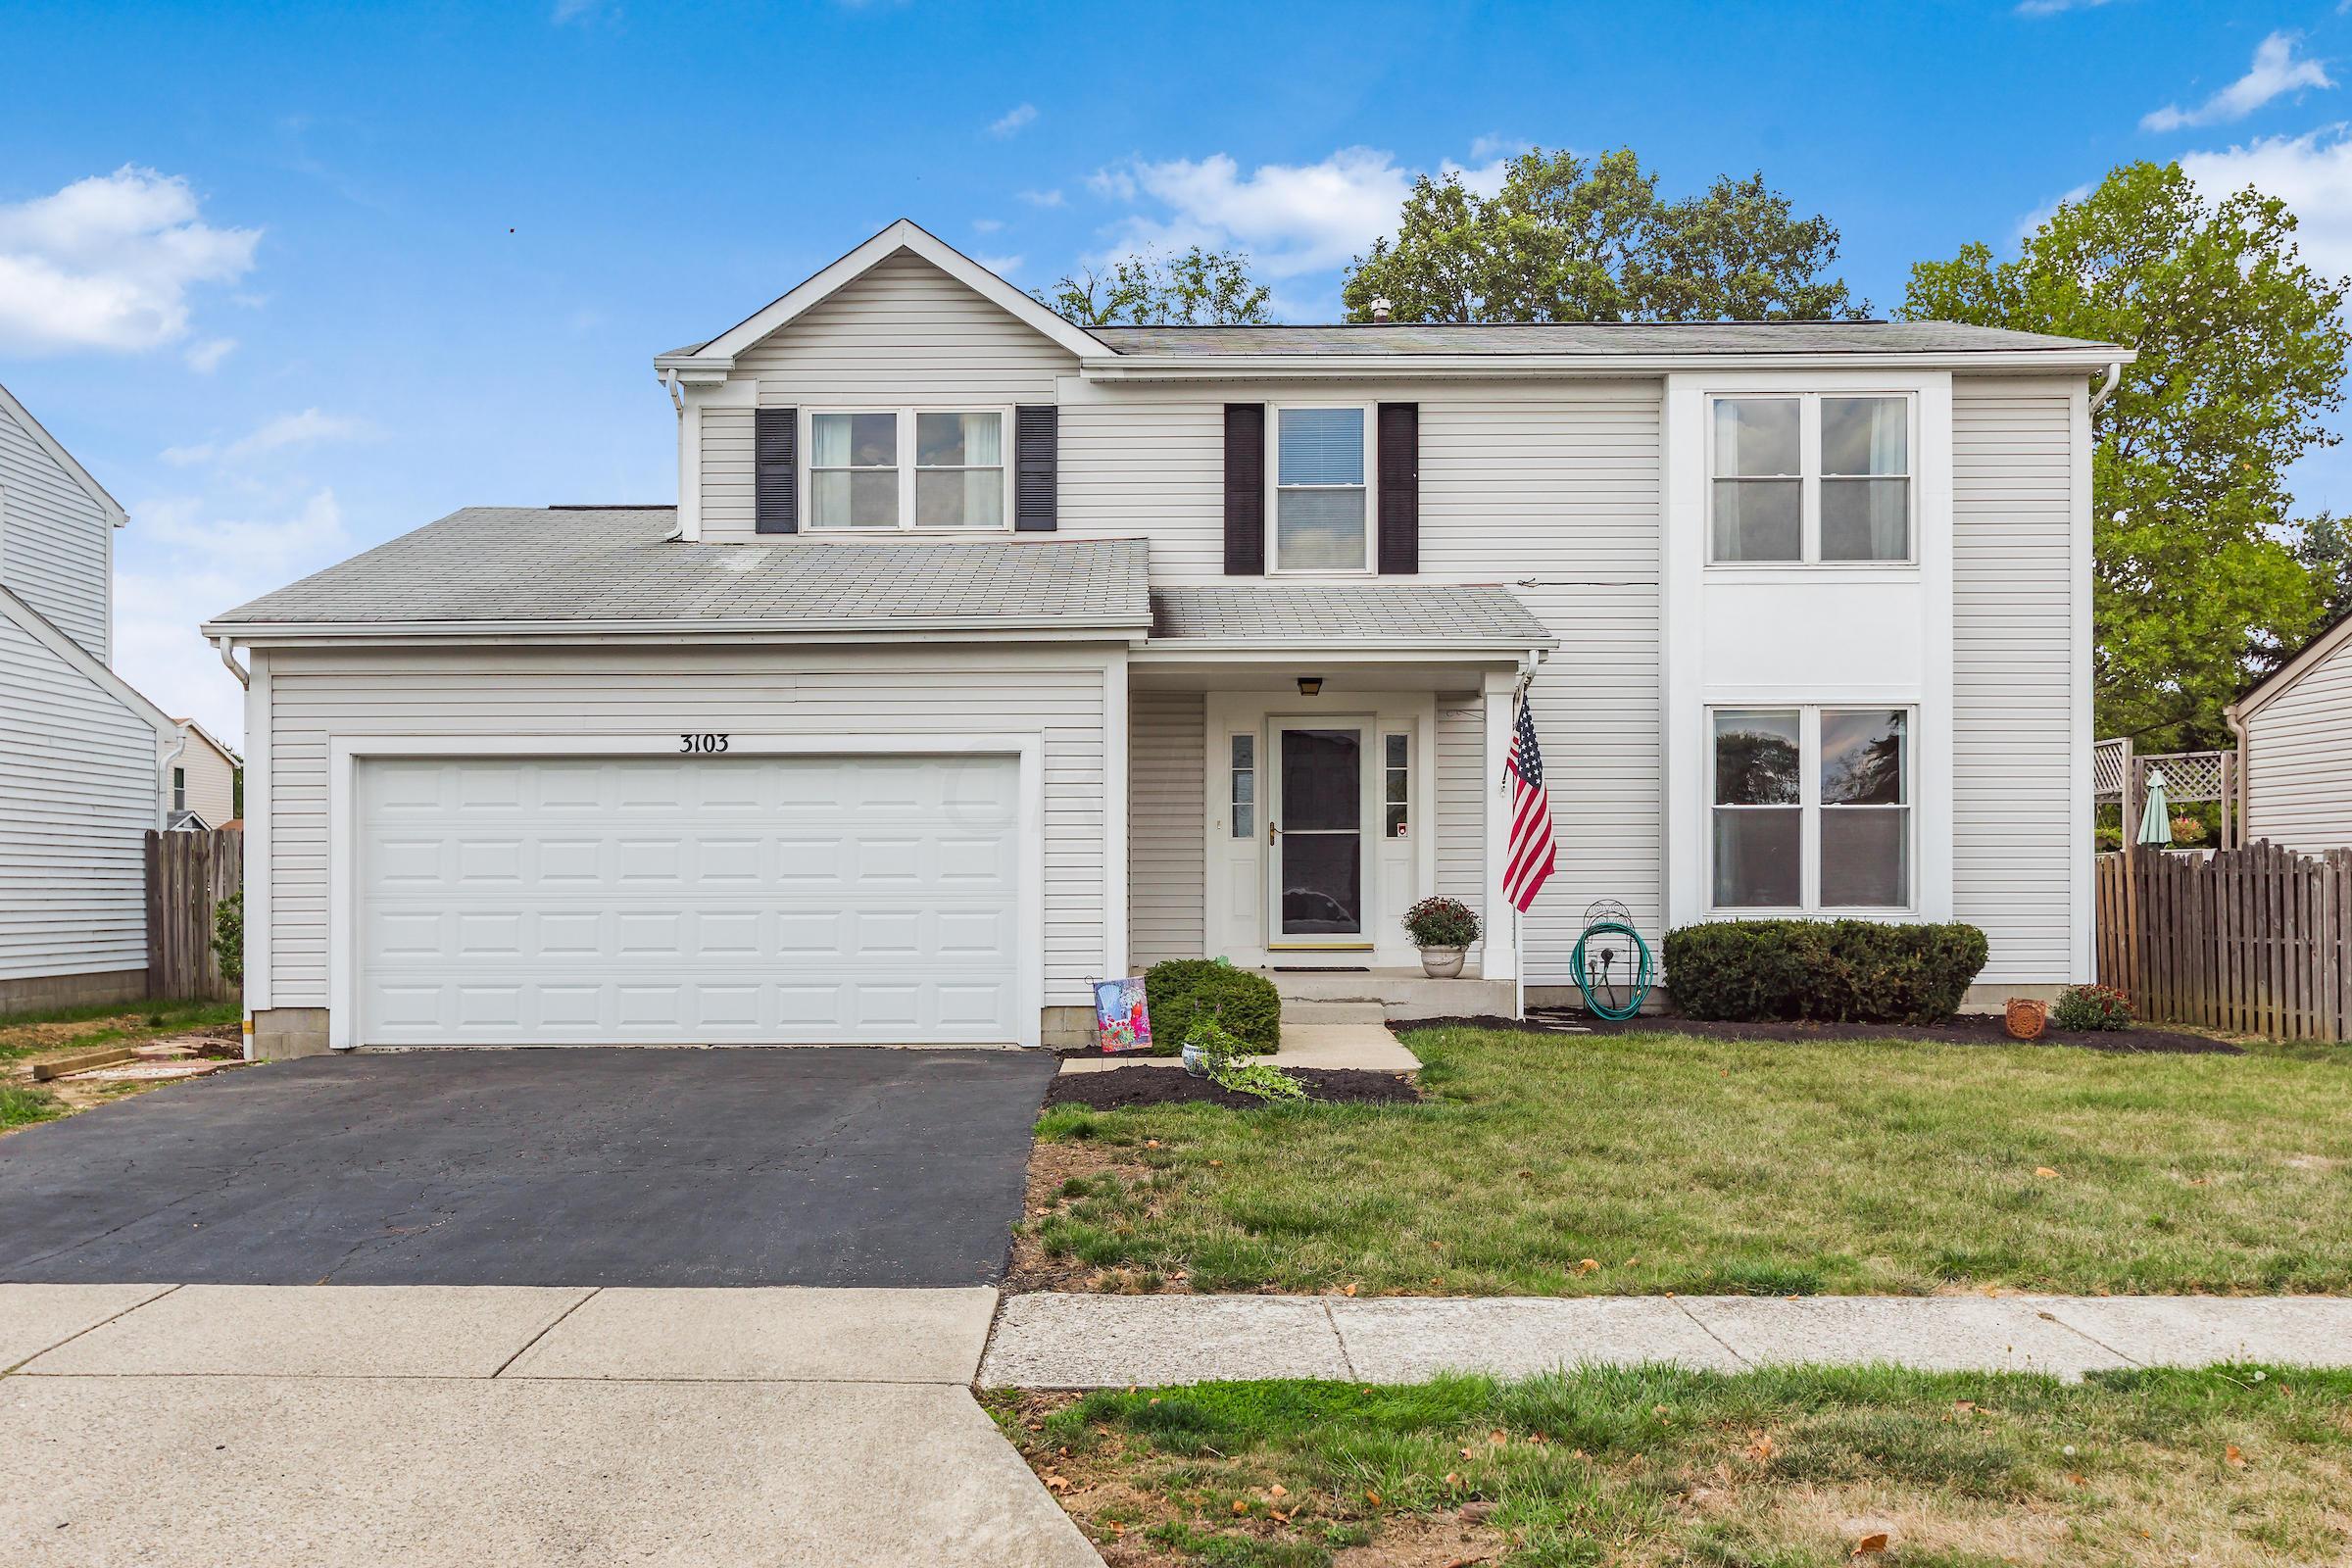 3103 Castlebrook Avenue, Hilliard, Ohio 43026, 3 Bedrooms Bedrooms, ,3 BathroomsBathrooms,Residential,For Sale,Castlebrook,220031851